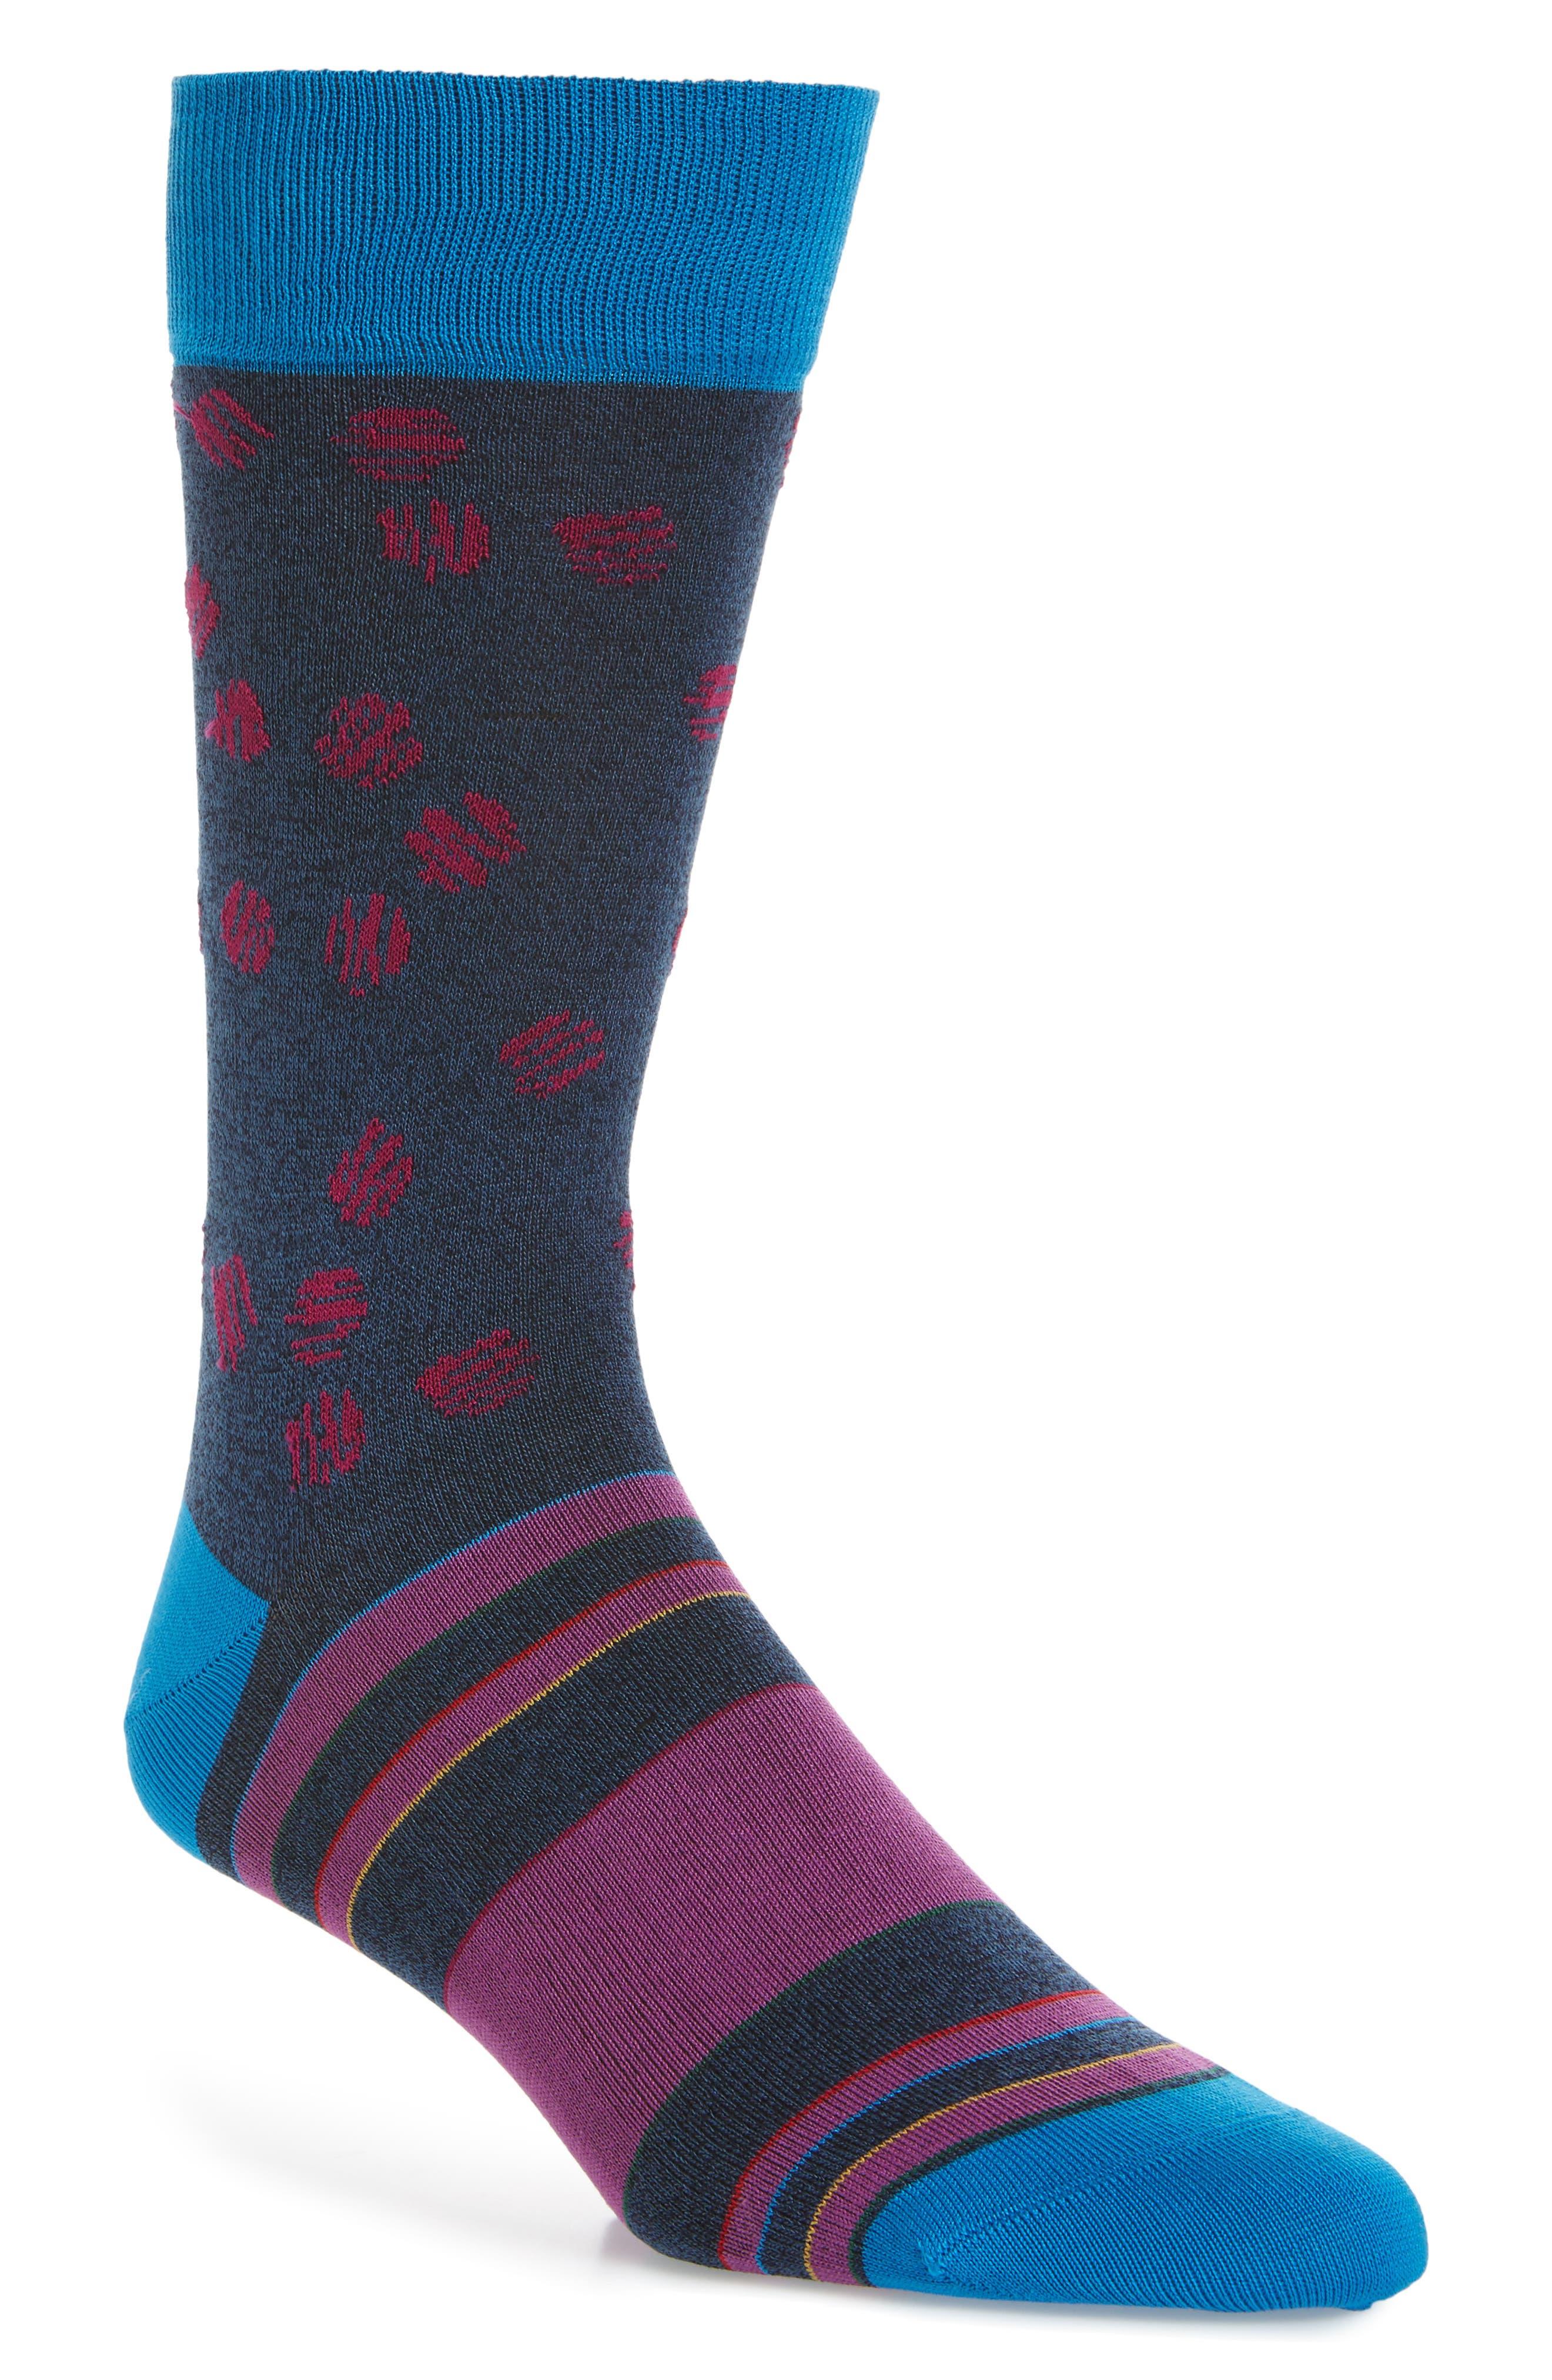 Cotton Blend Socks,                         Main,                         color, Navy